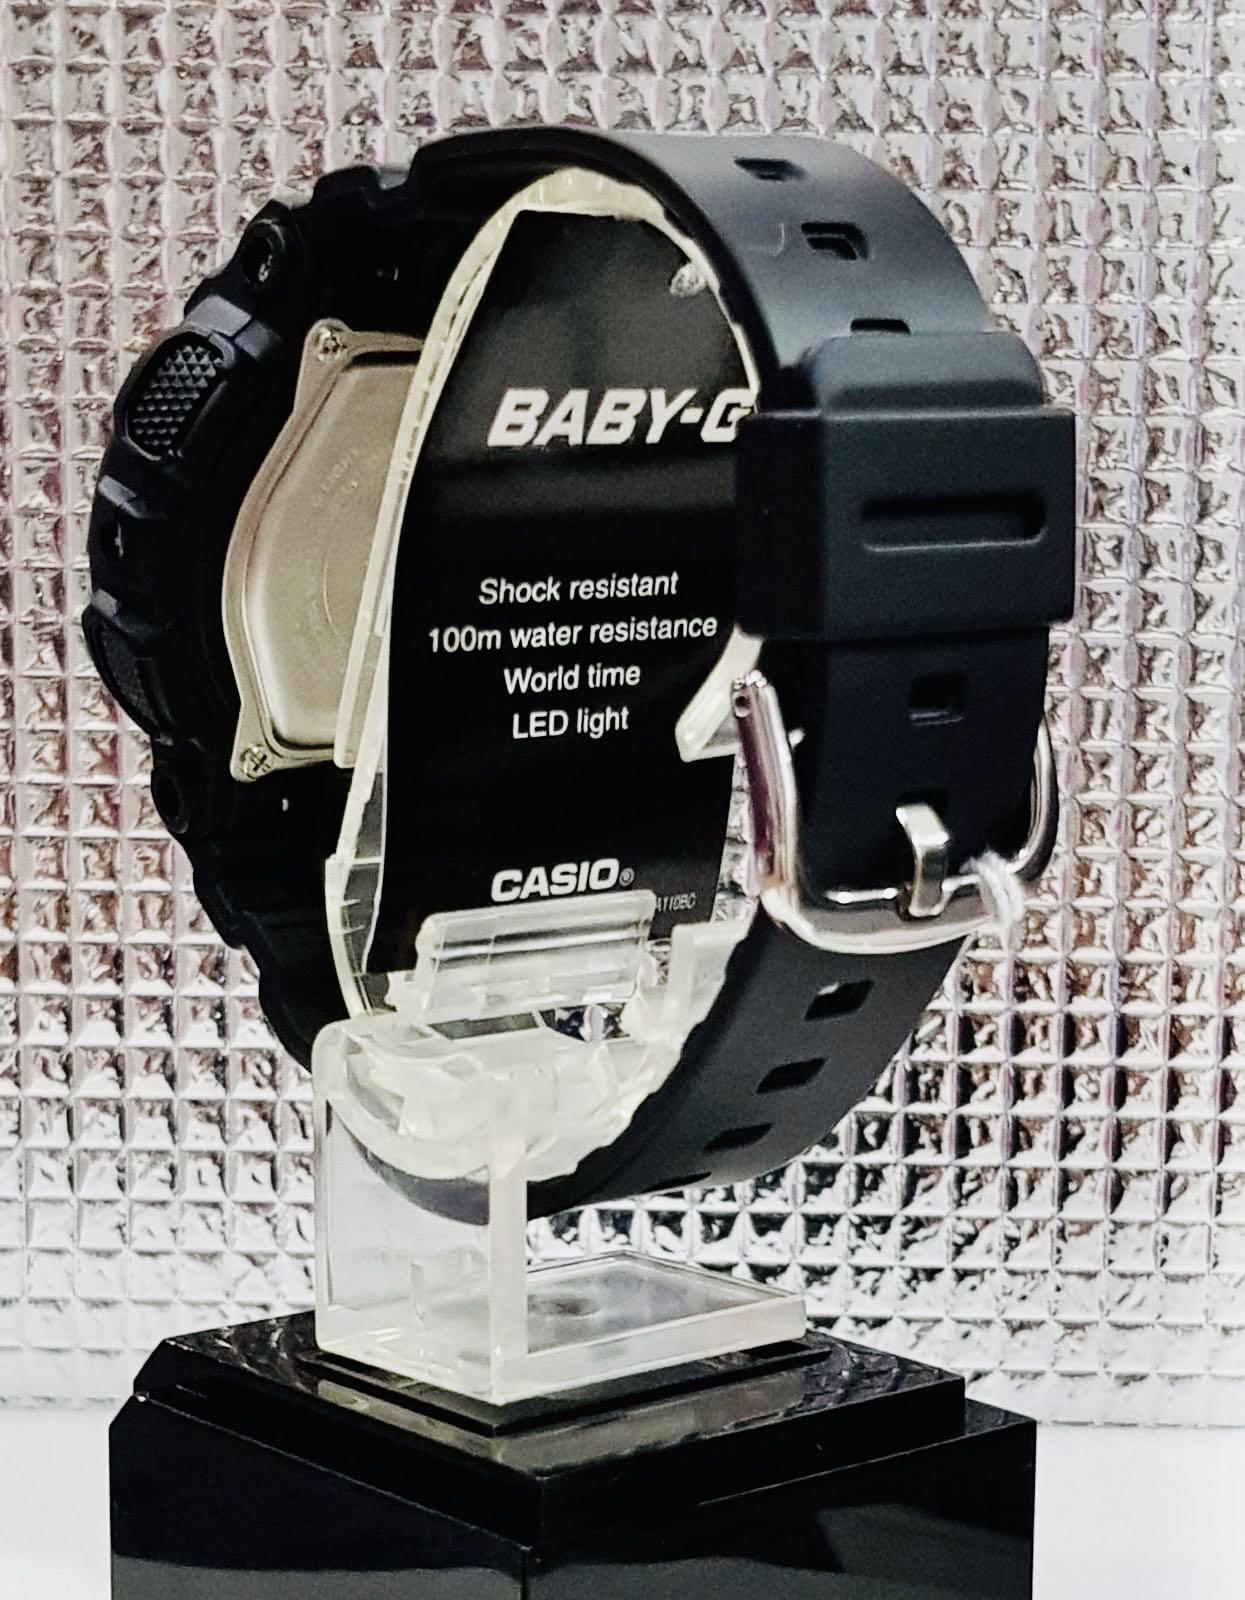 NEW🌟BABYG UNISEX SPORTS WATCH : 100% ORIGINAL AUTHENTIC CASIO BABY-G-SHOCK ( GSHOCK ) : BA-110RG-1A / BA-110-RG-1A (BLACK ROSE-GOLD)